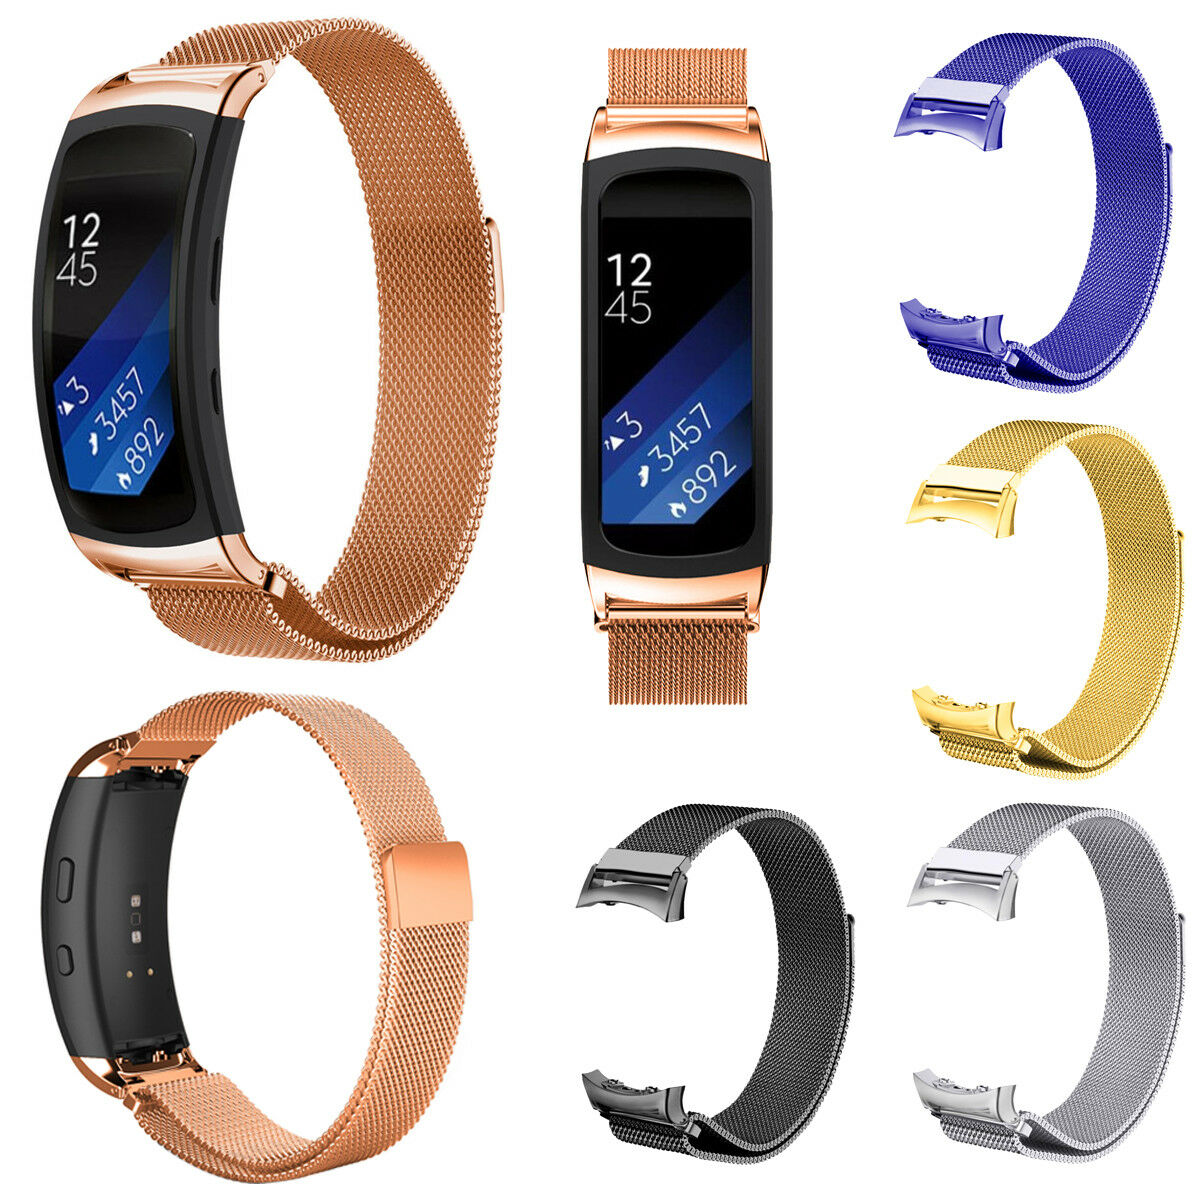 wristwatch bands - HD1200×1200